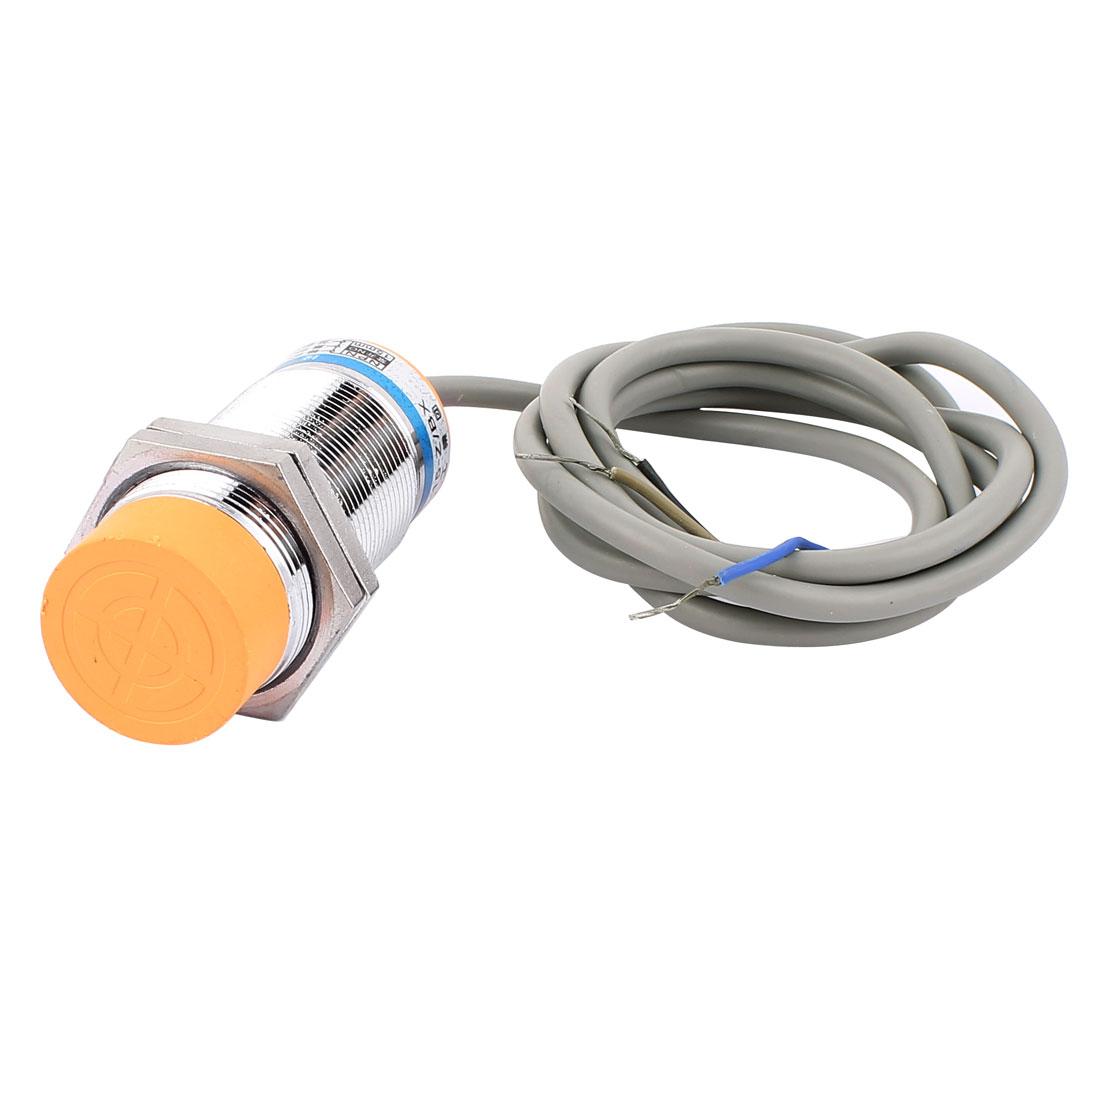 LJ30A3-15-Z/BX 3-Wire NPN NO 15mm Approach Inductive Proximity Sensor Switch DC 6-36V 300mA